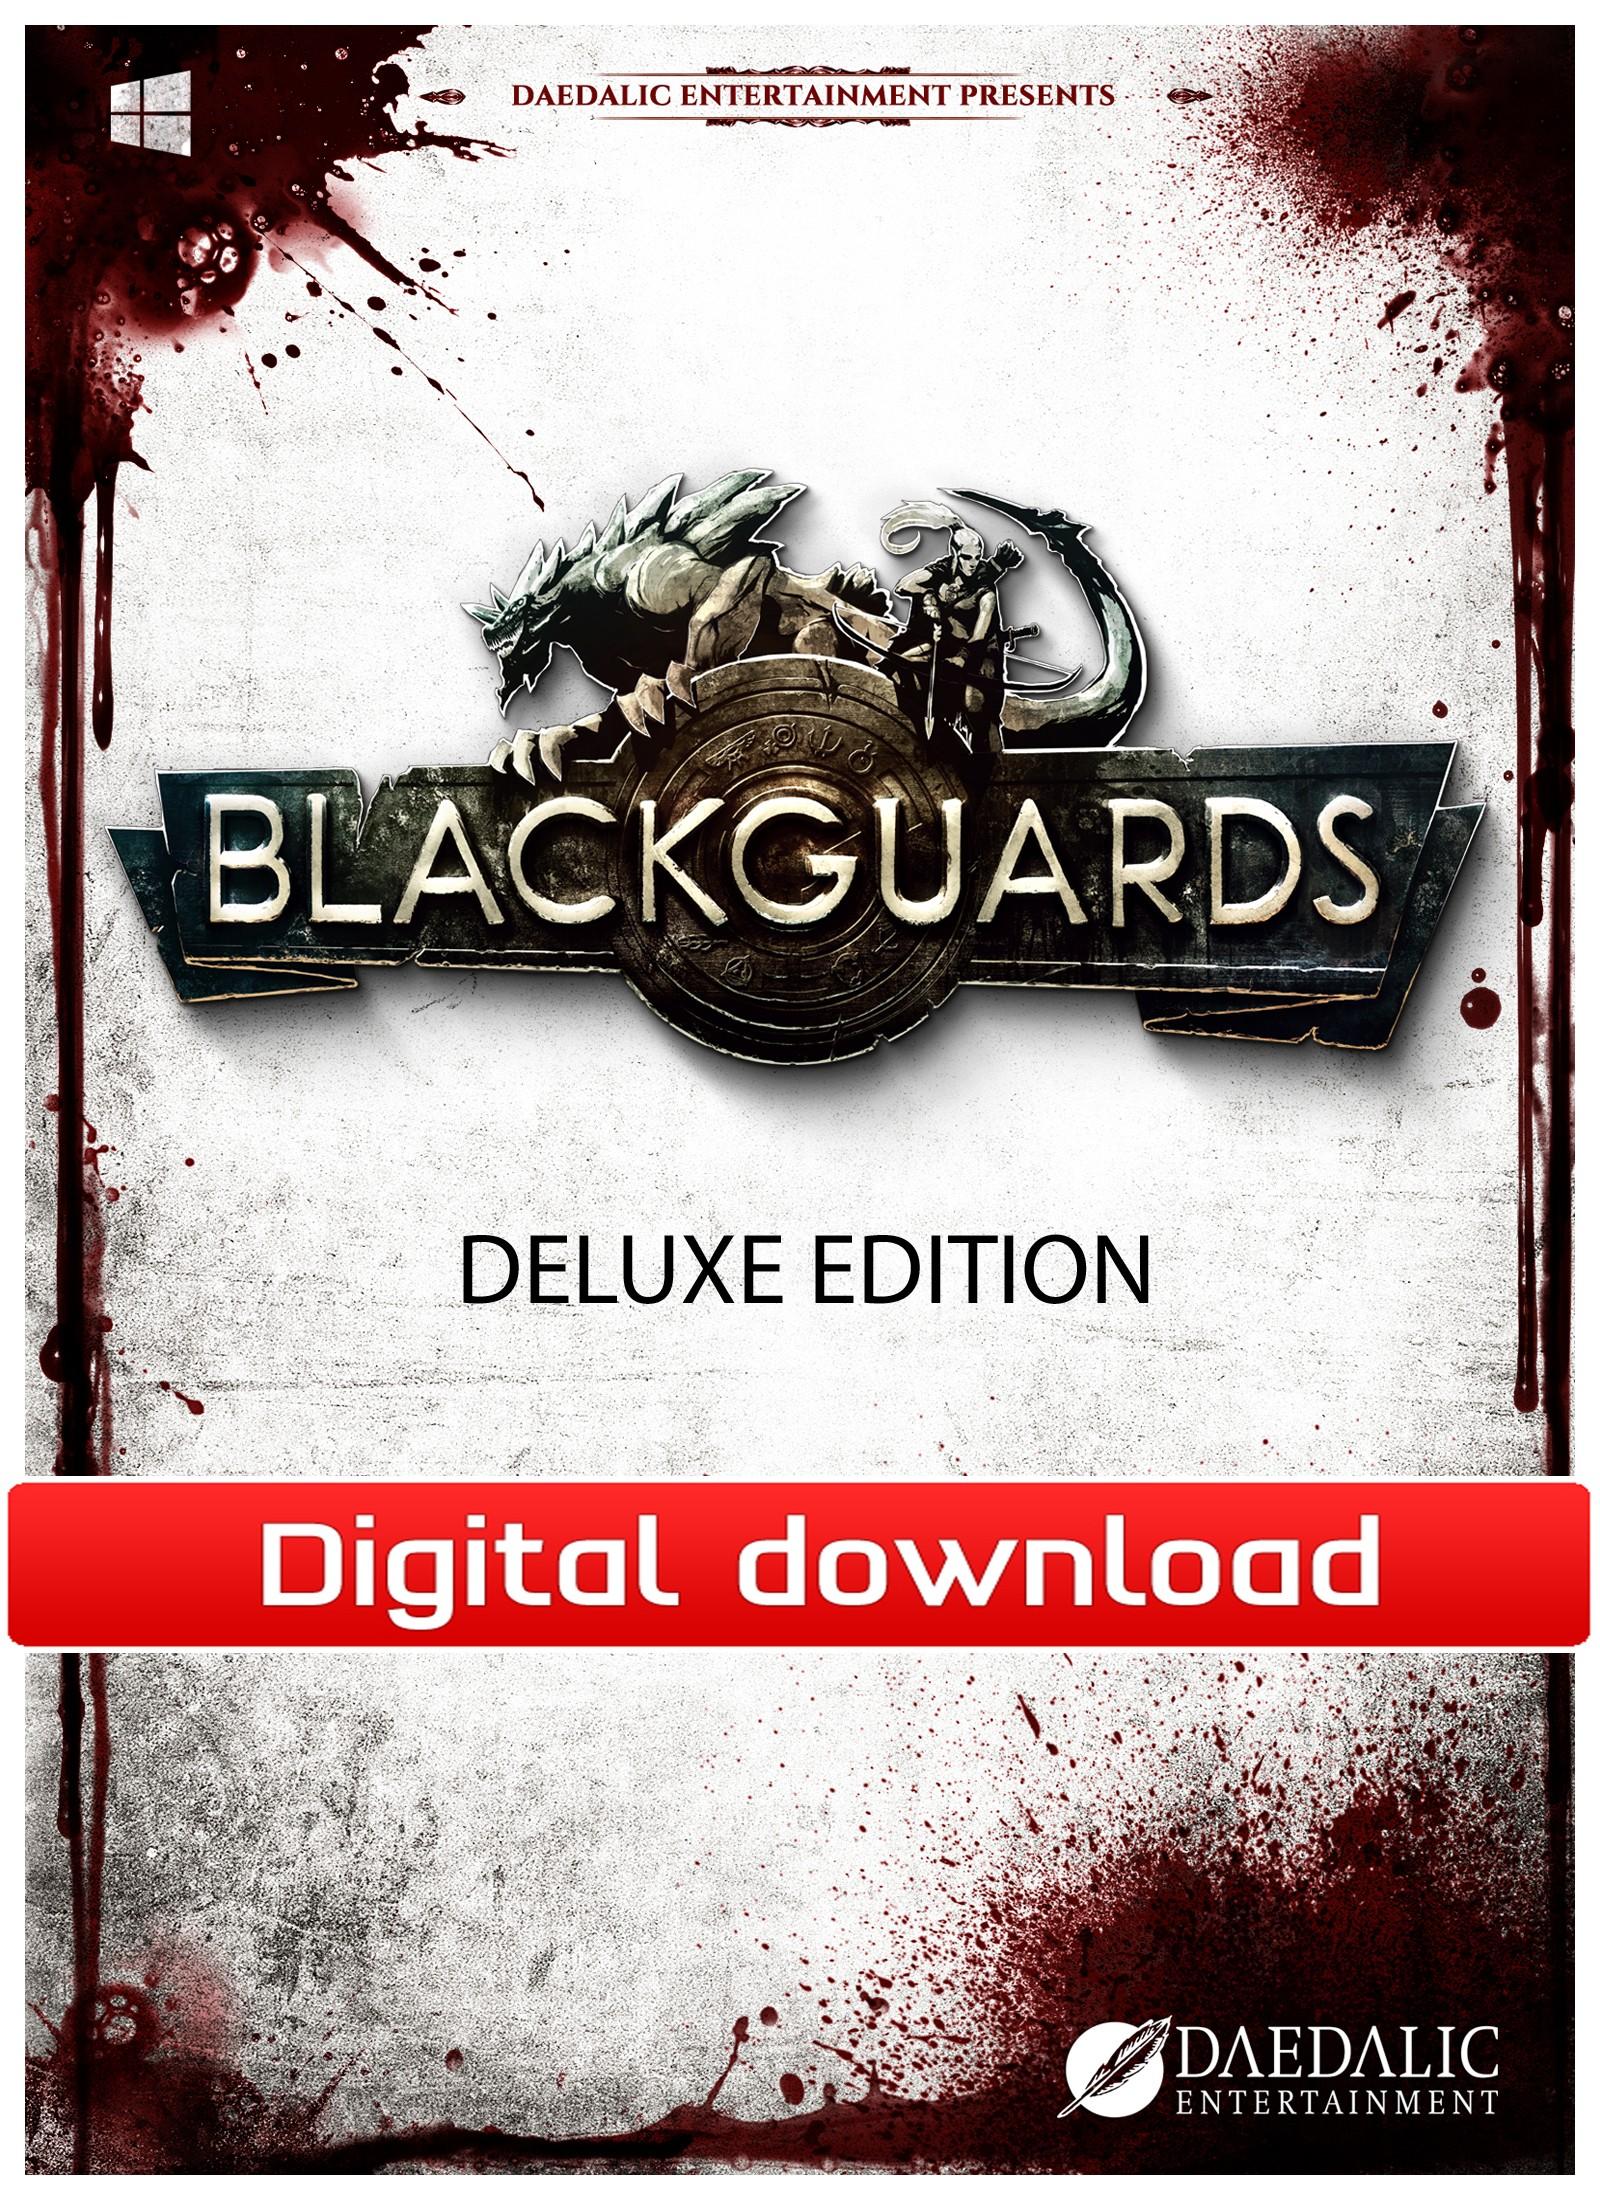 36367 : Blackguards Deluxe Edition (PC nedlastning)